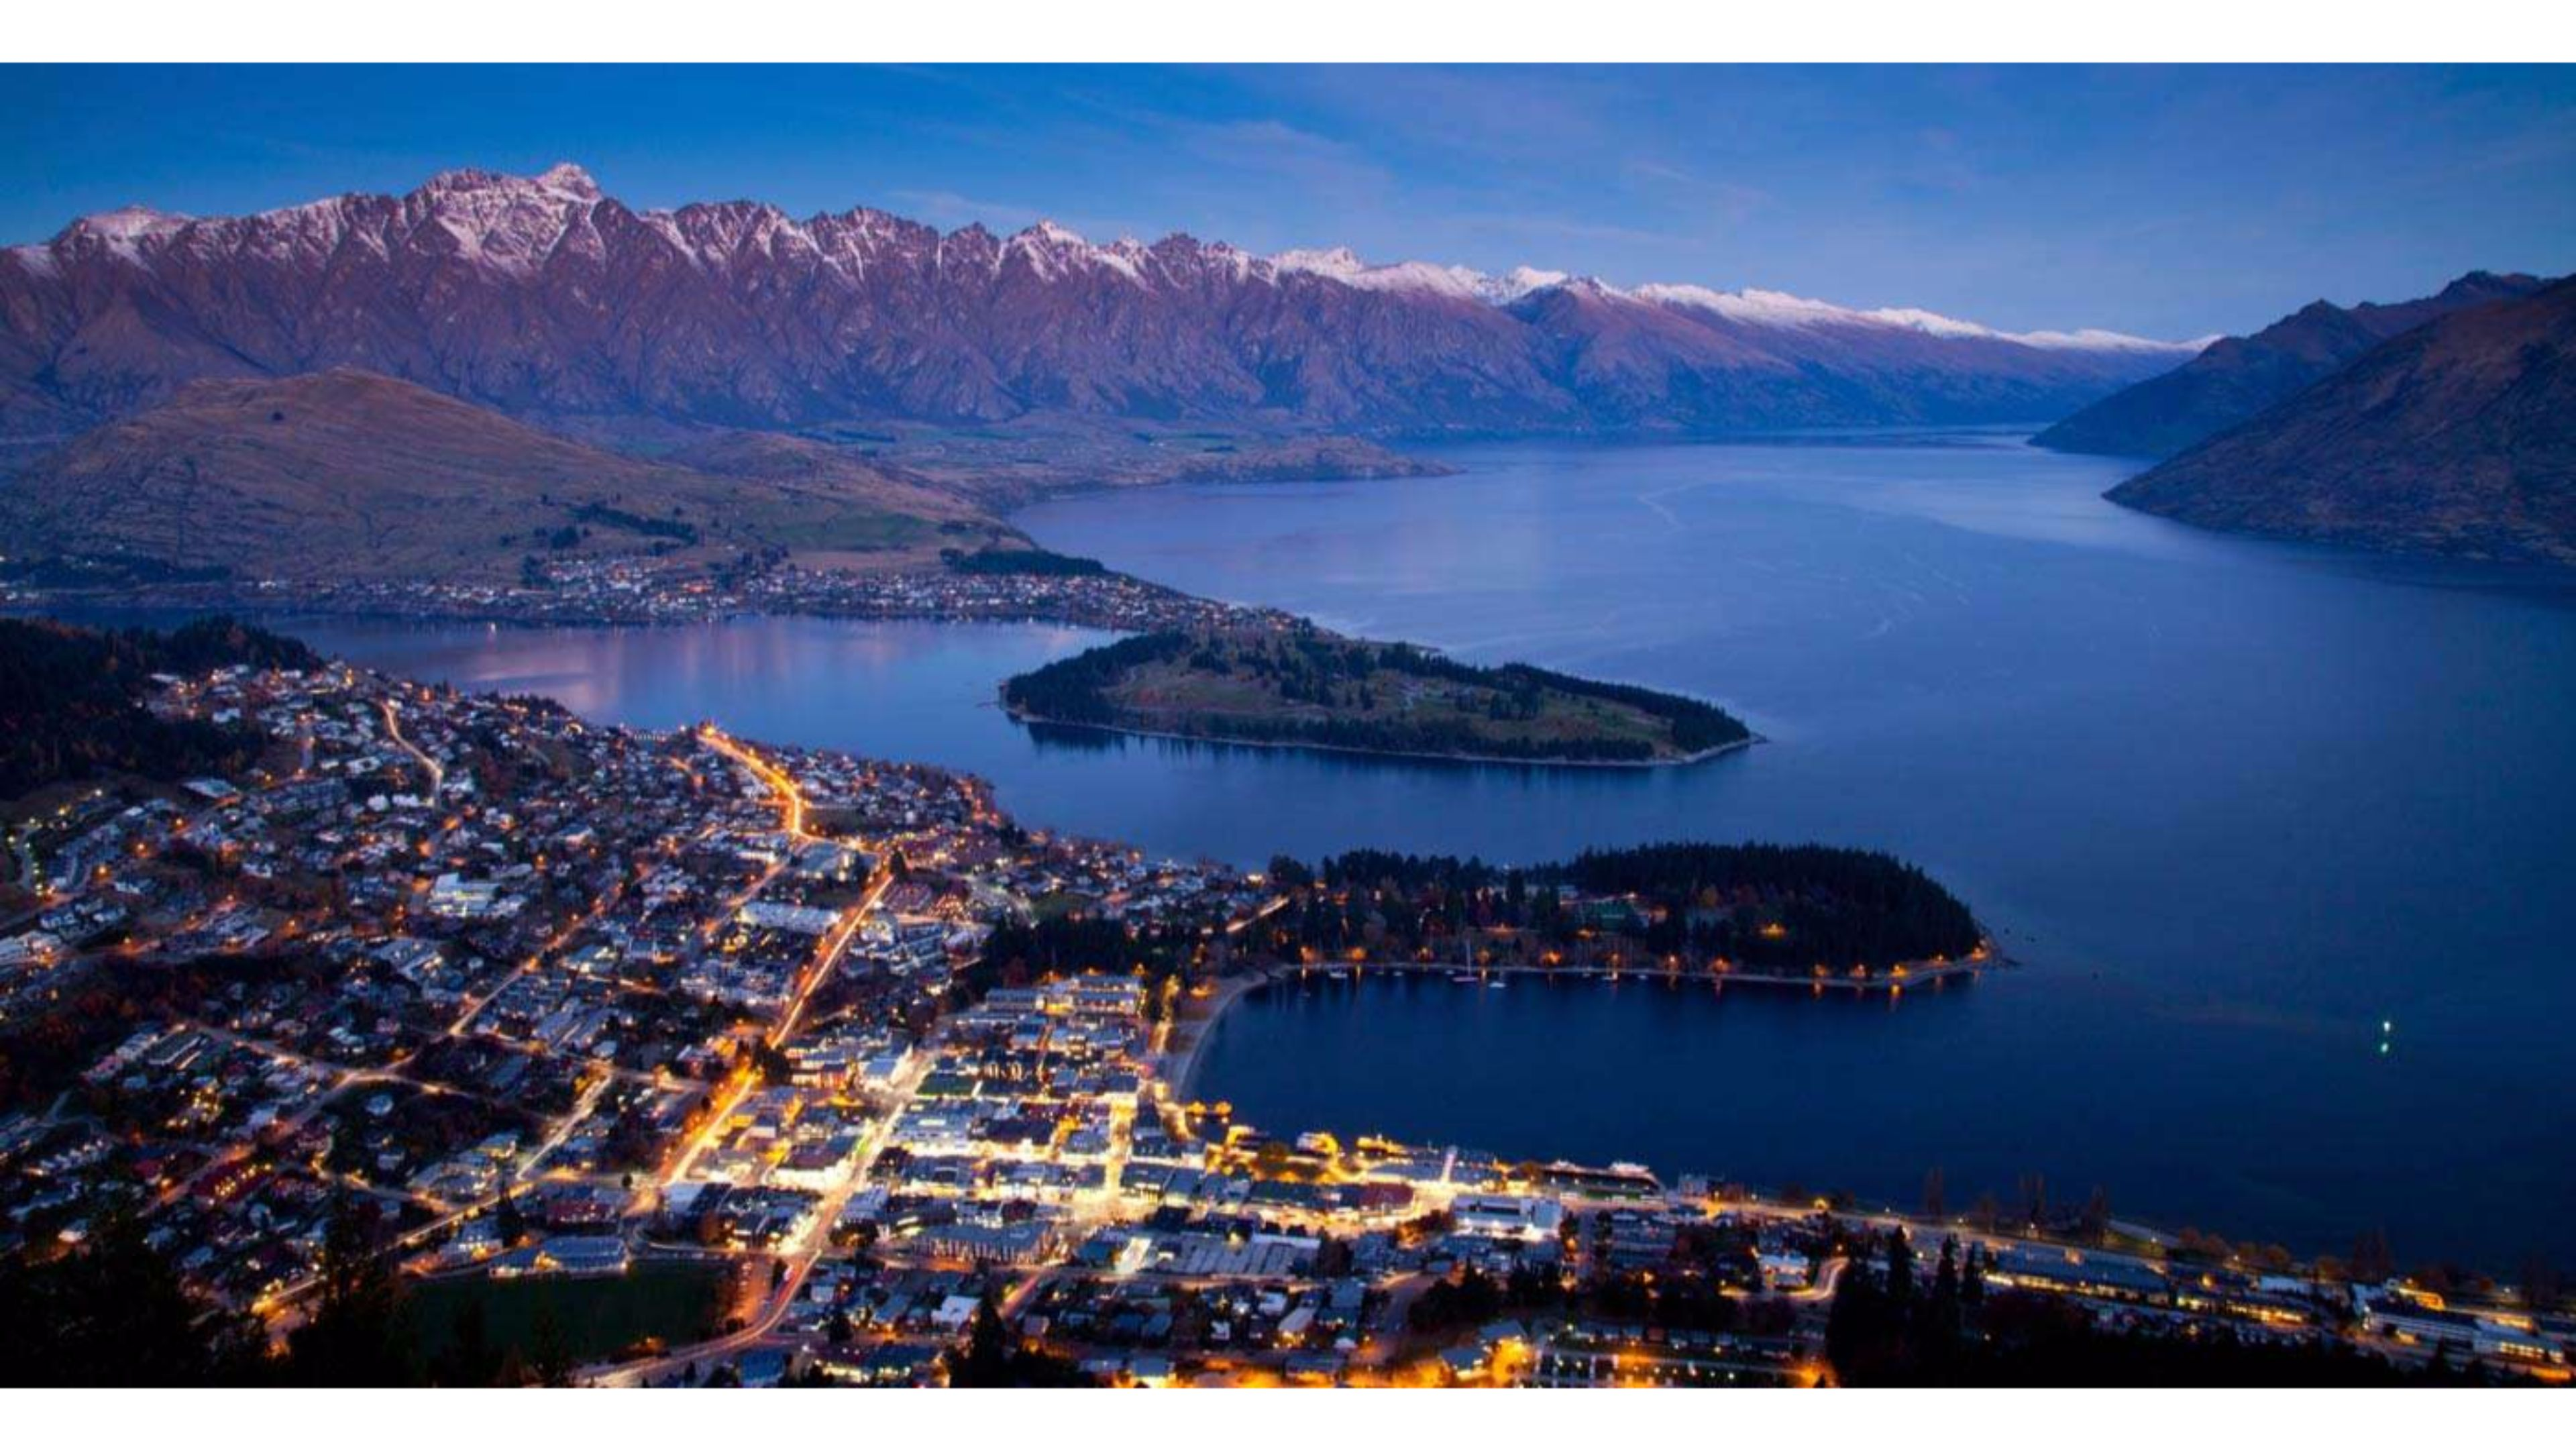 New Zealand Wellington wallpaper 3840x2160